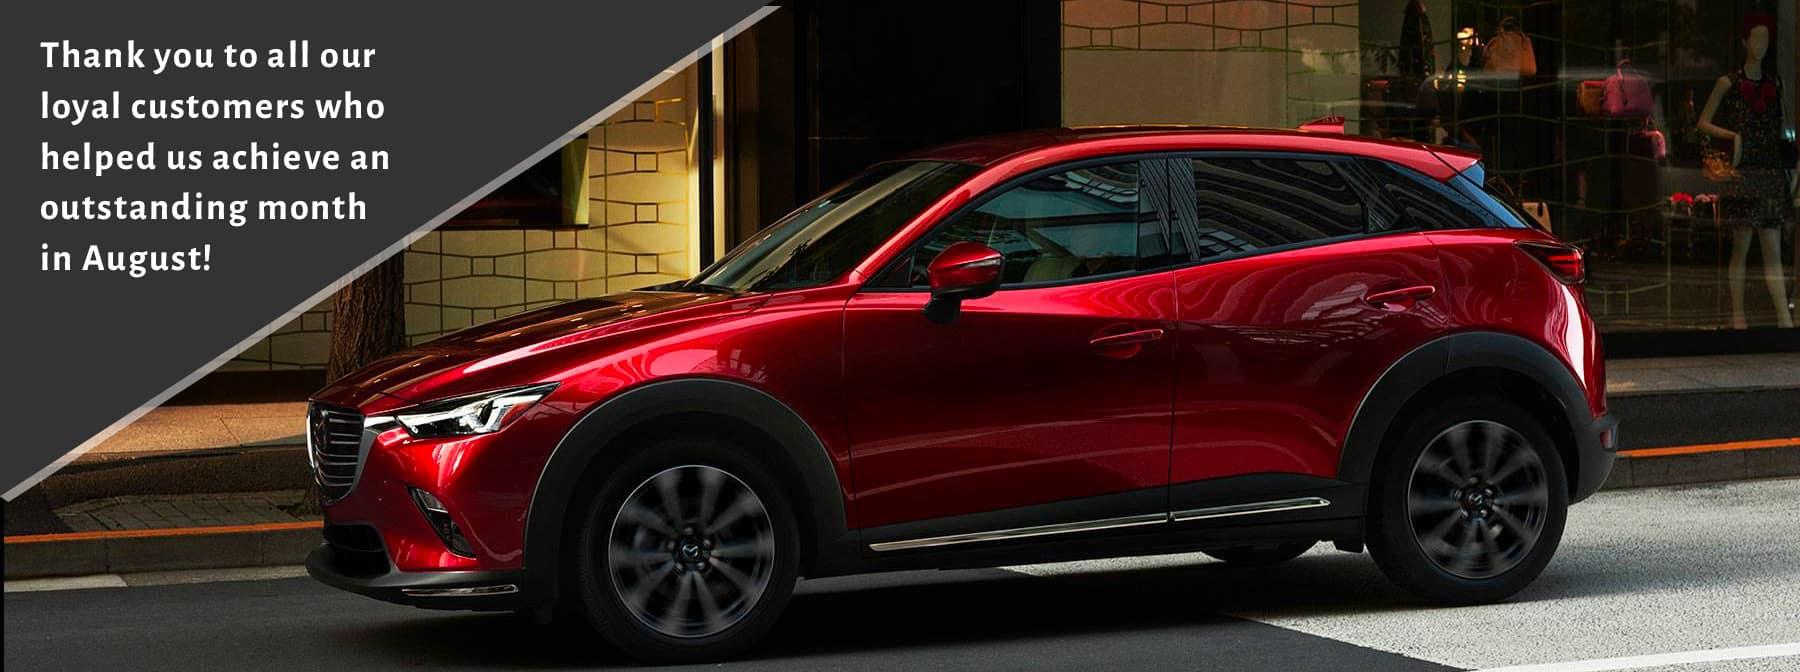 Mazda Thank You